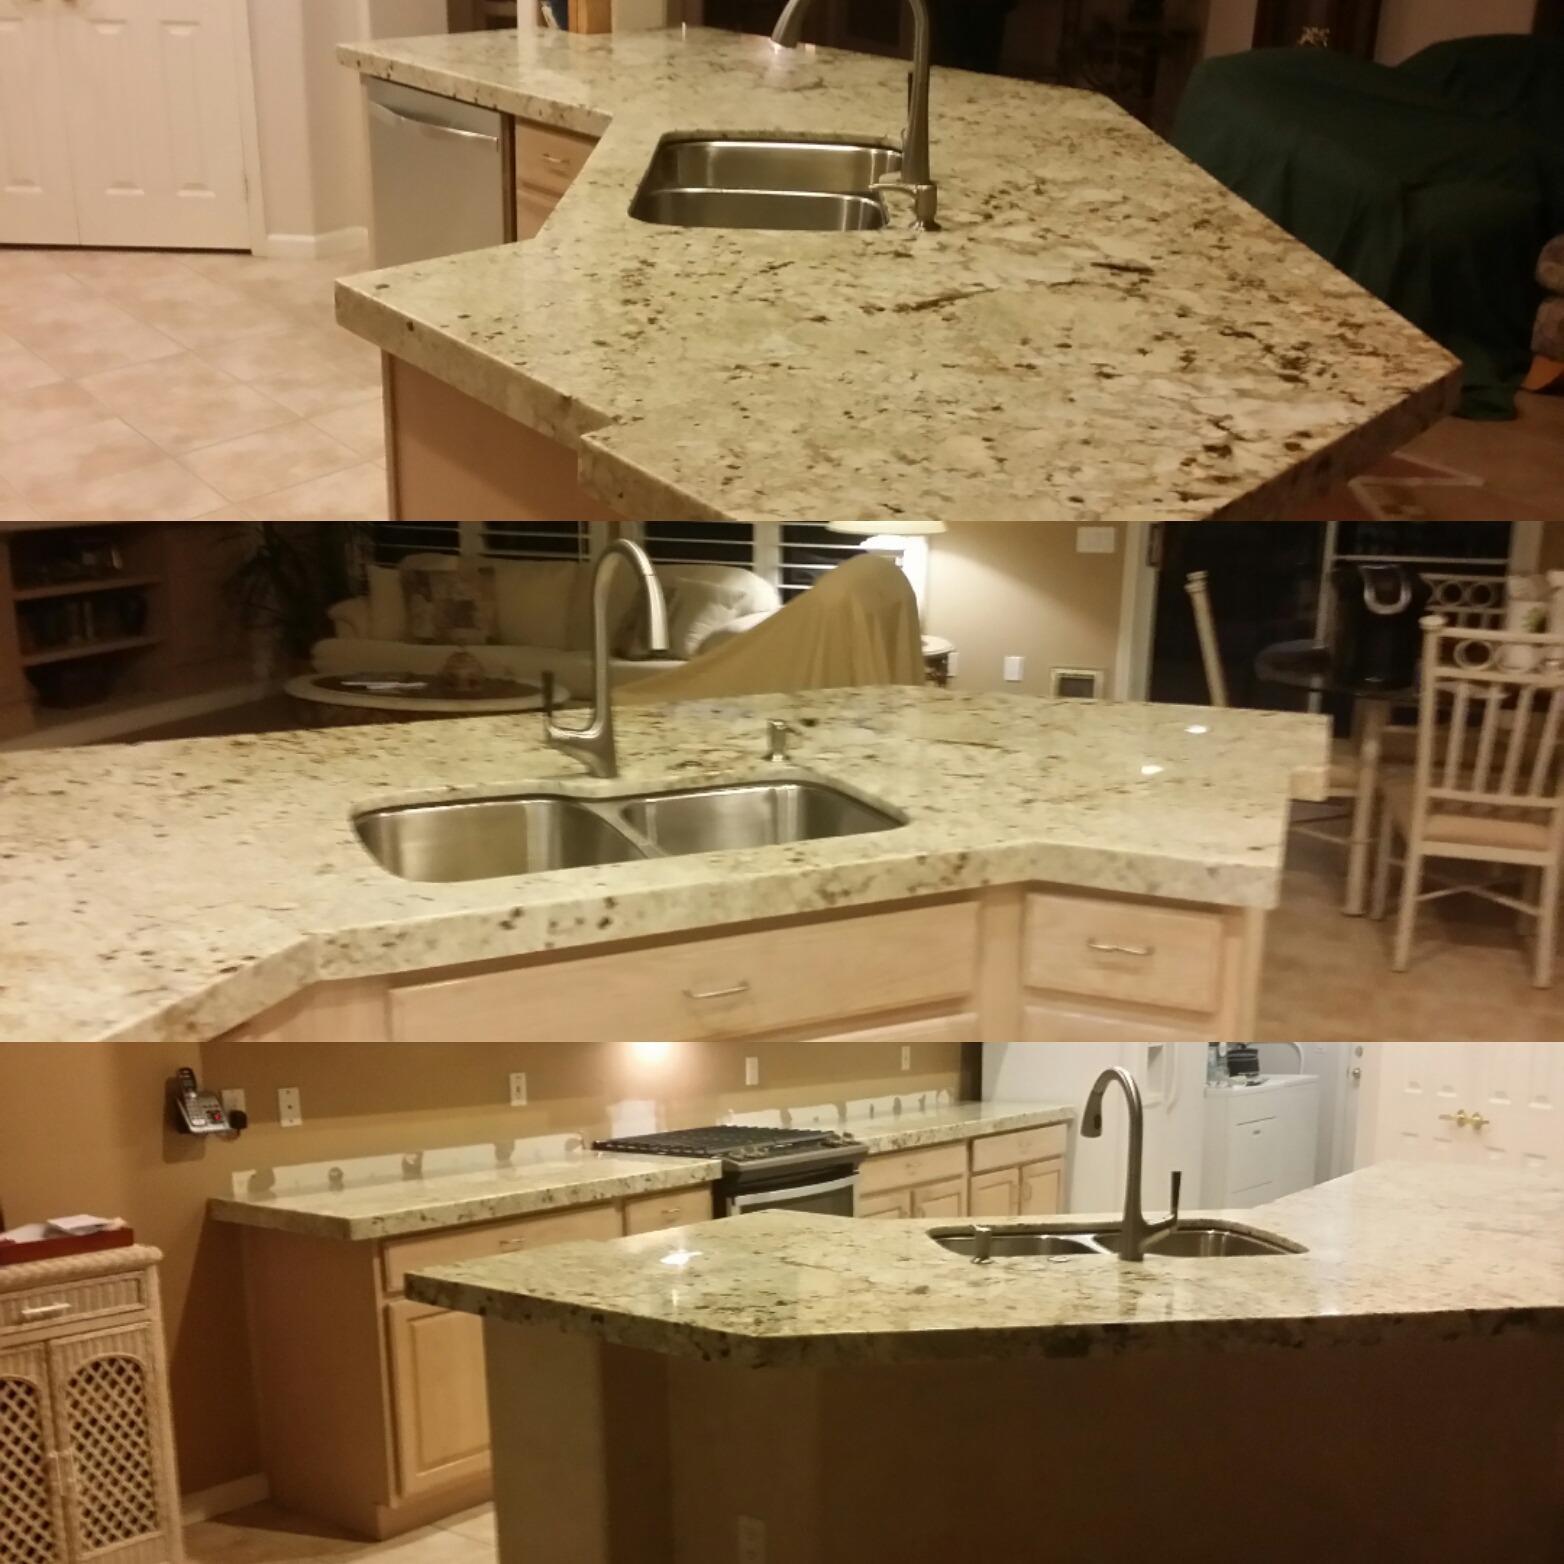 Glastone Marble and Granite